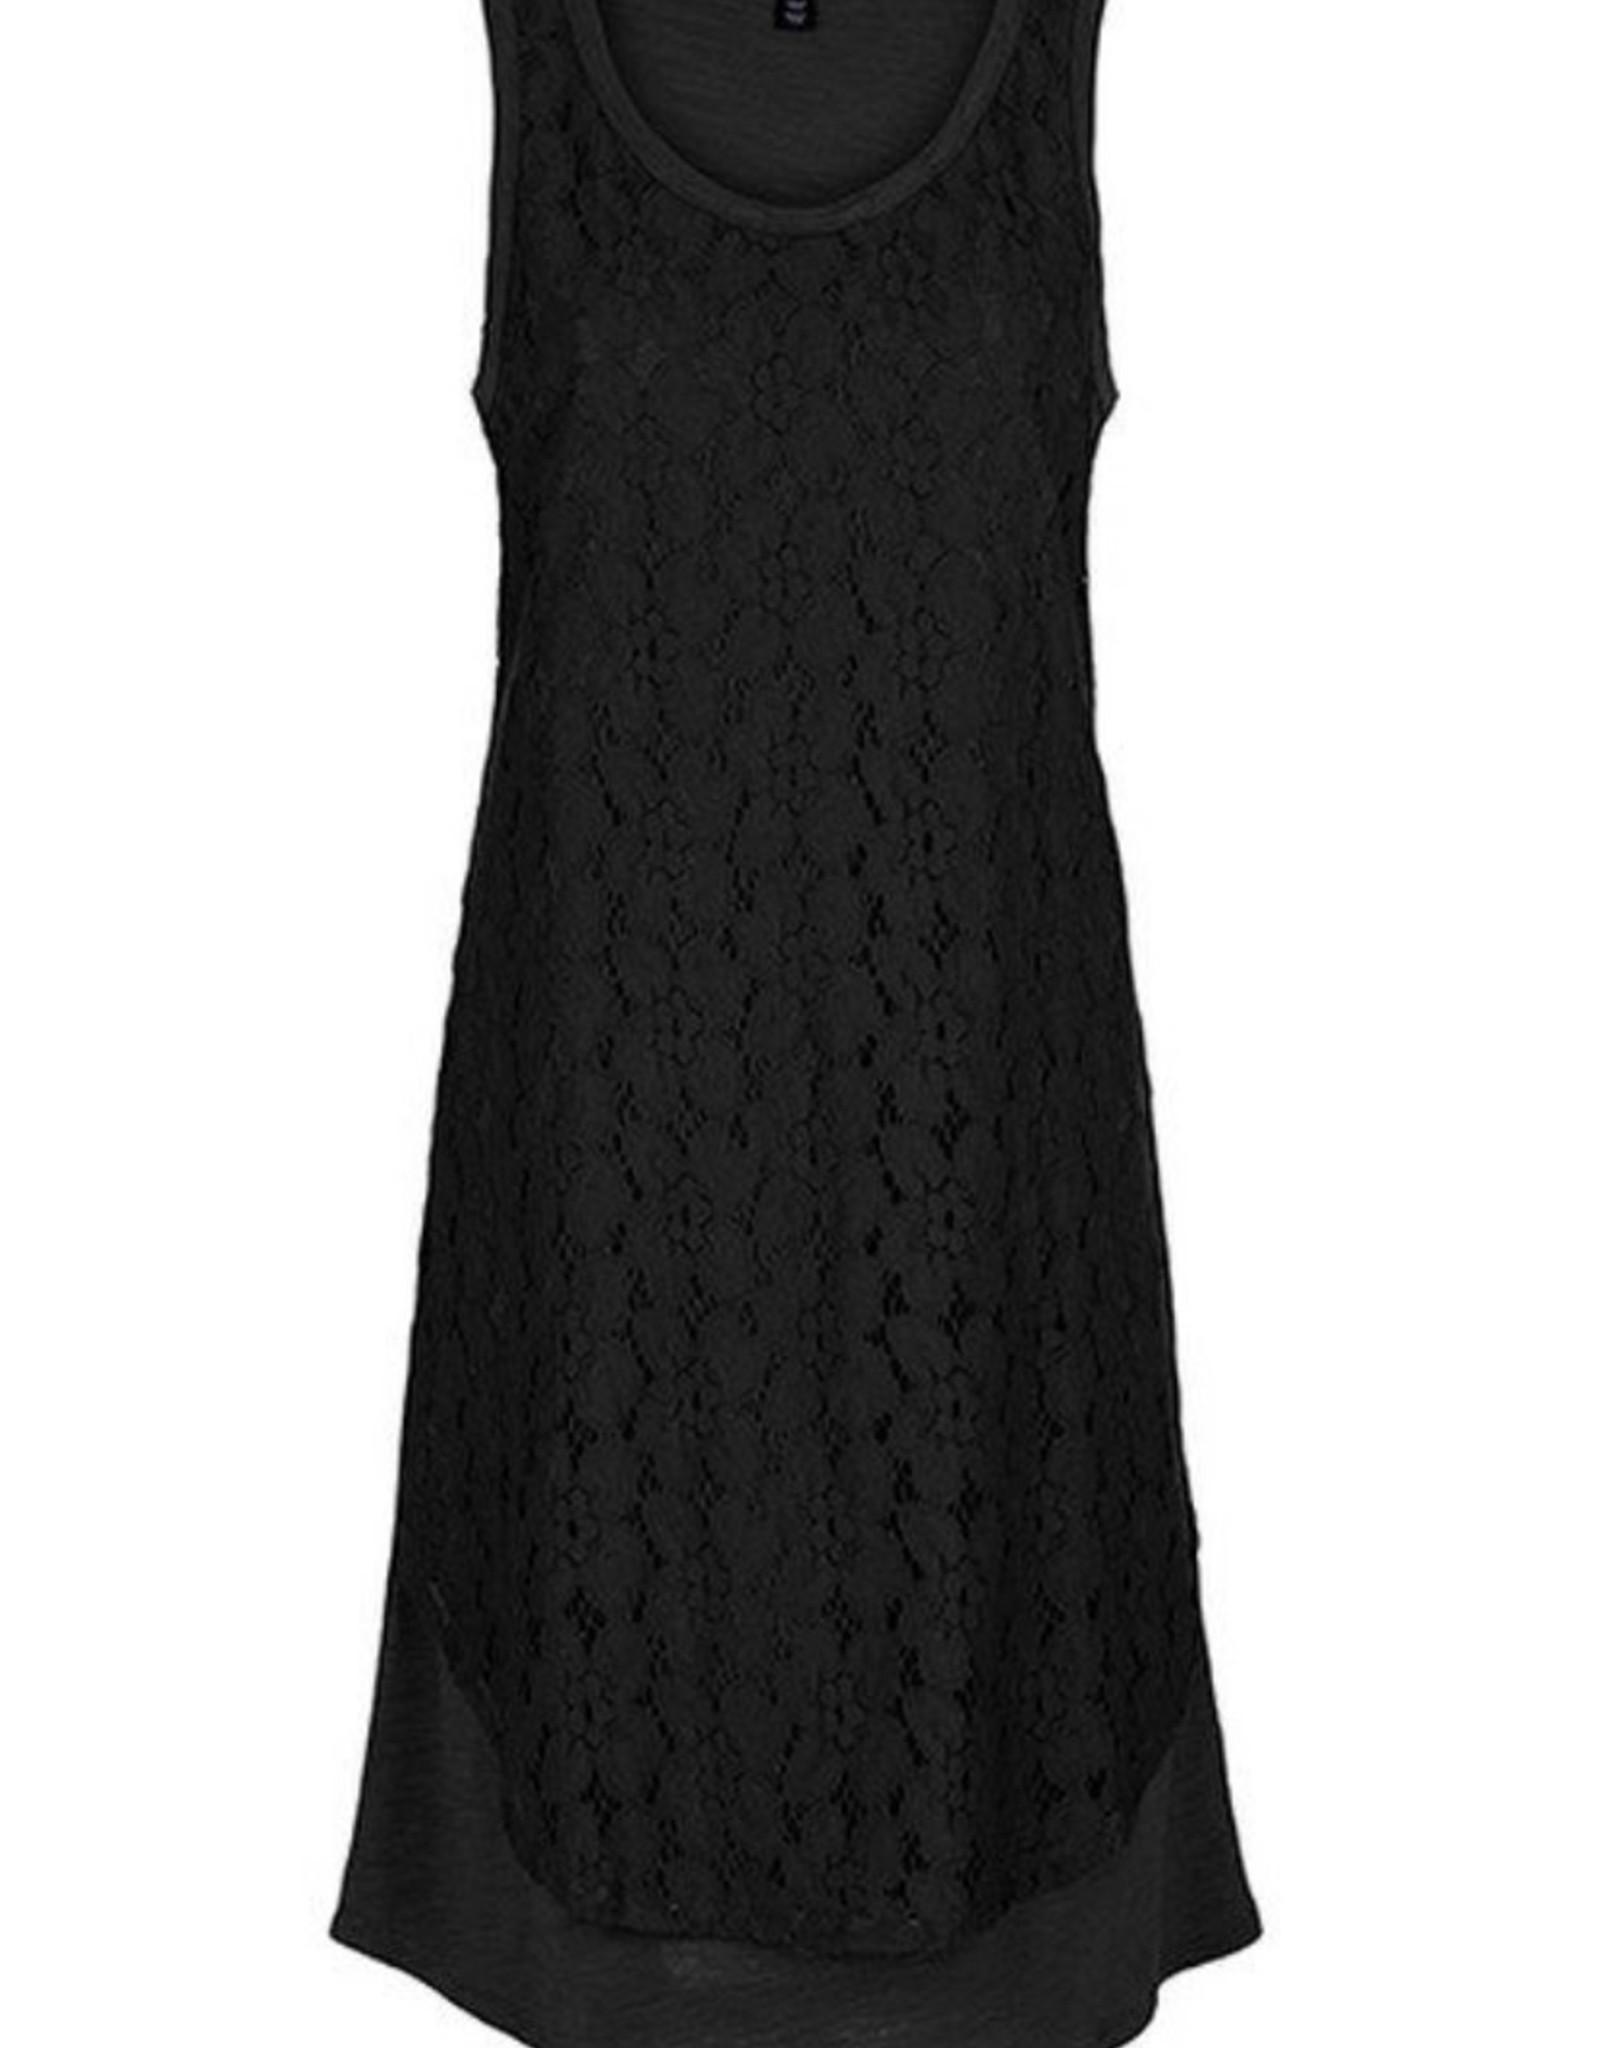 Lace overlay dress Black